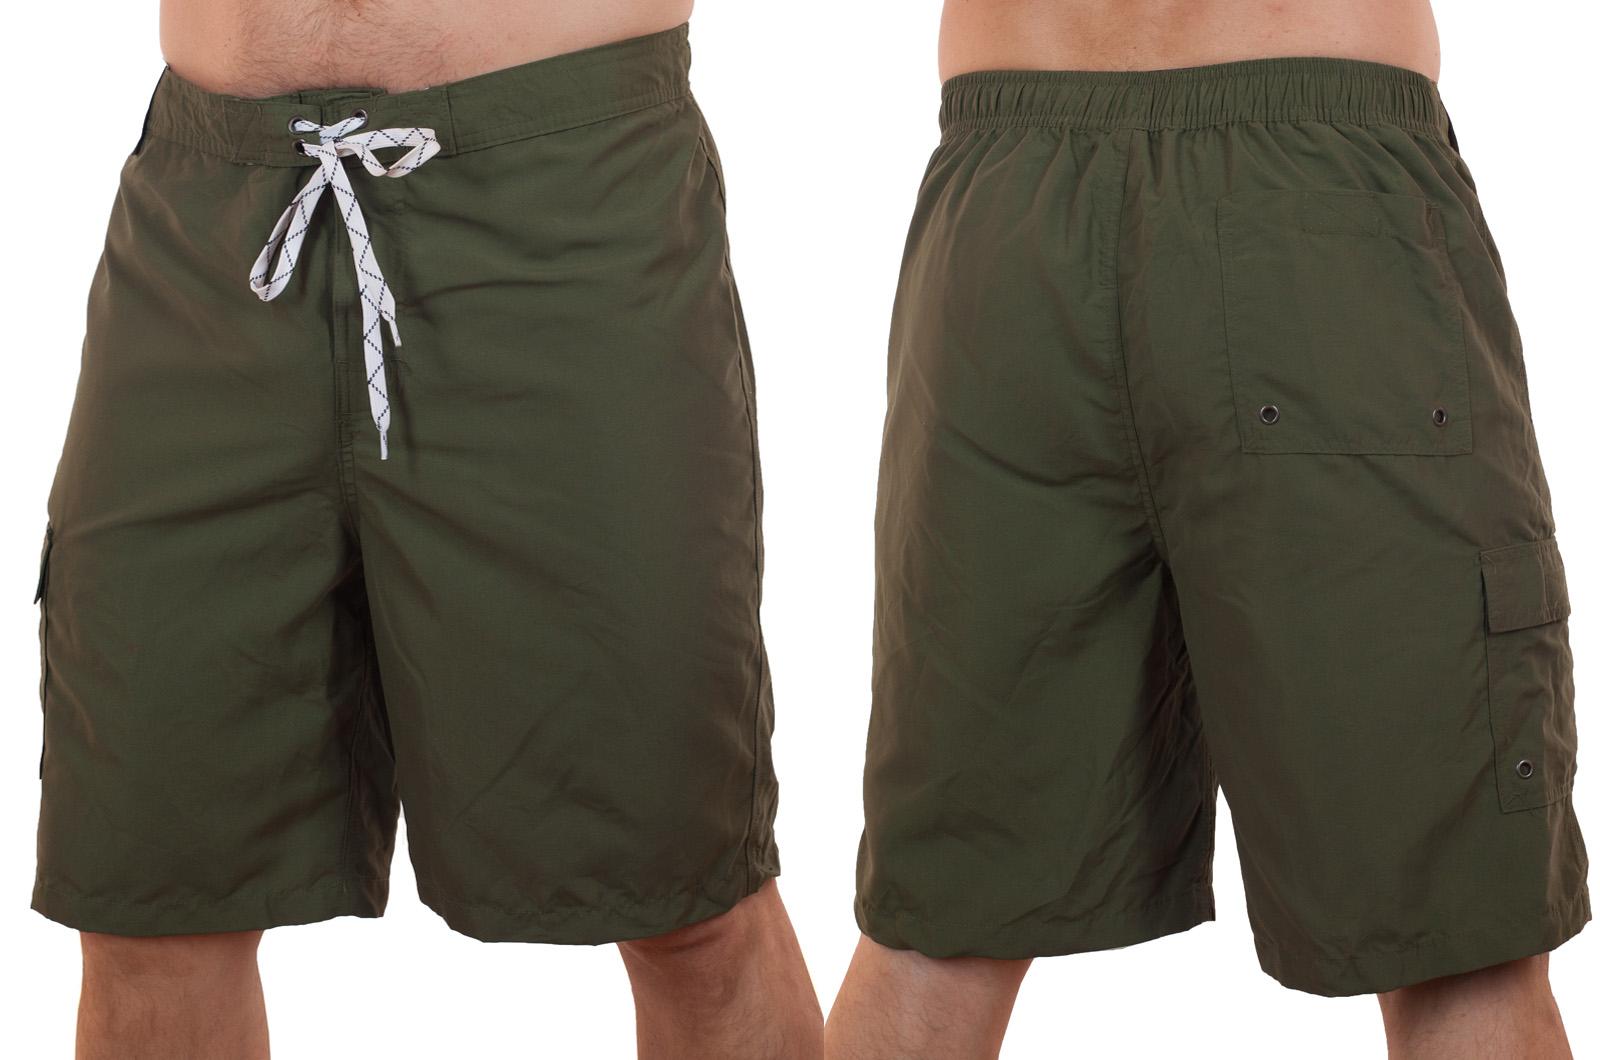 Мужские шорты хаки от Merona™ с доставкой